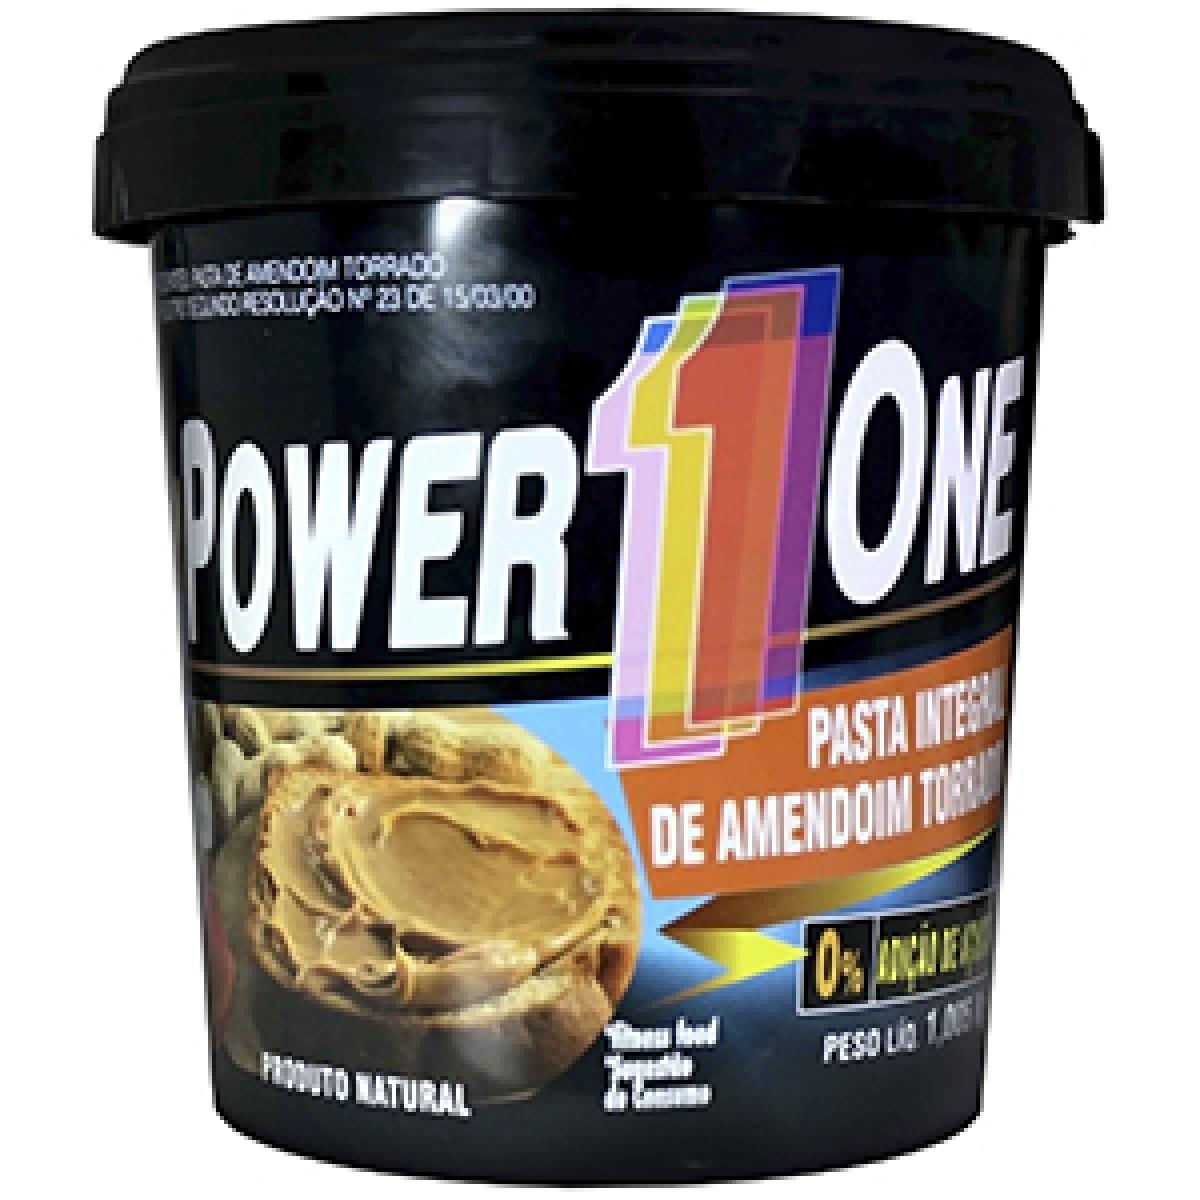 Foto 1 - Pasta de Amendoim Integral - Power 1One